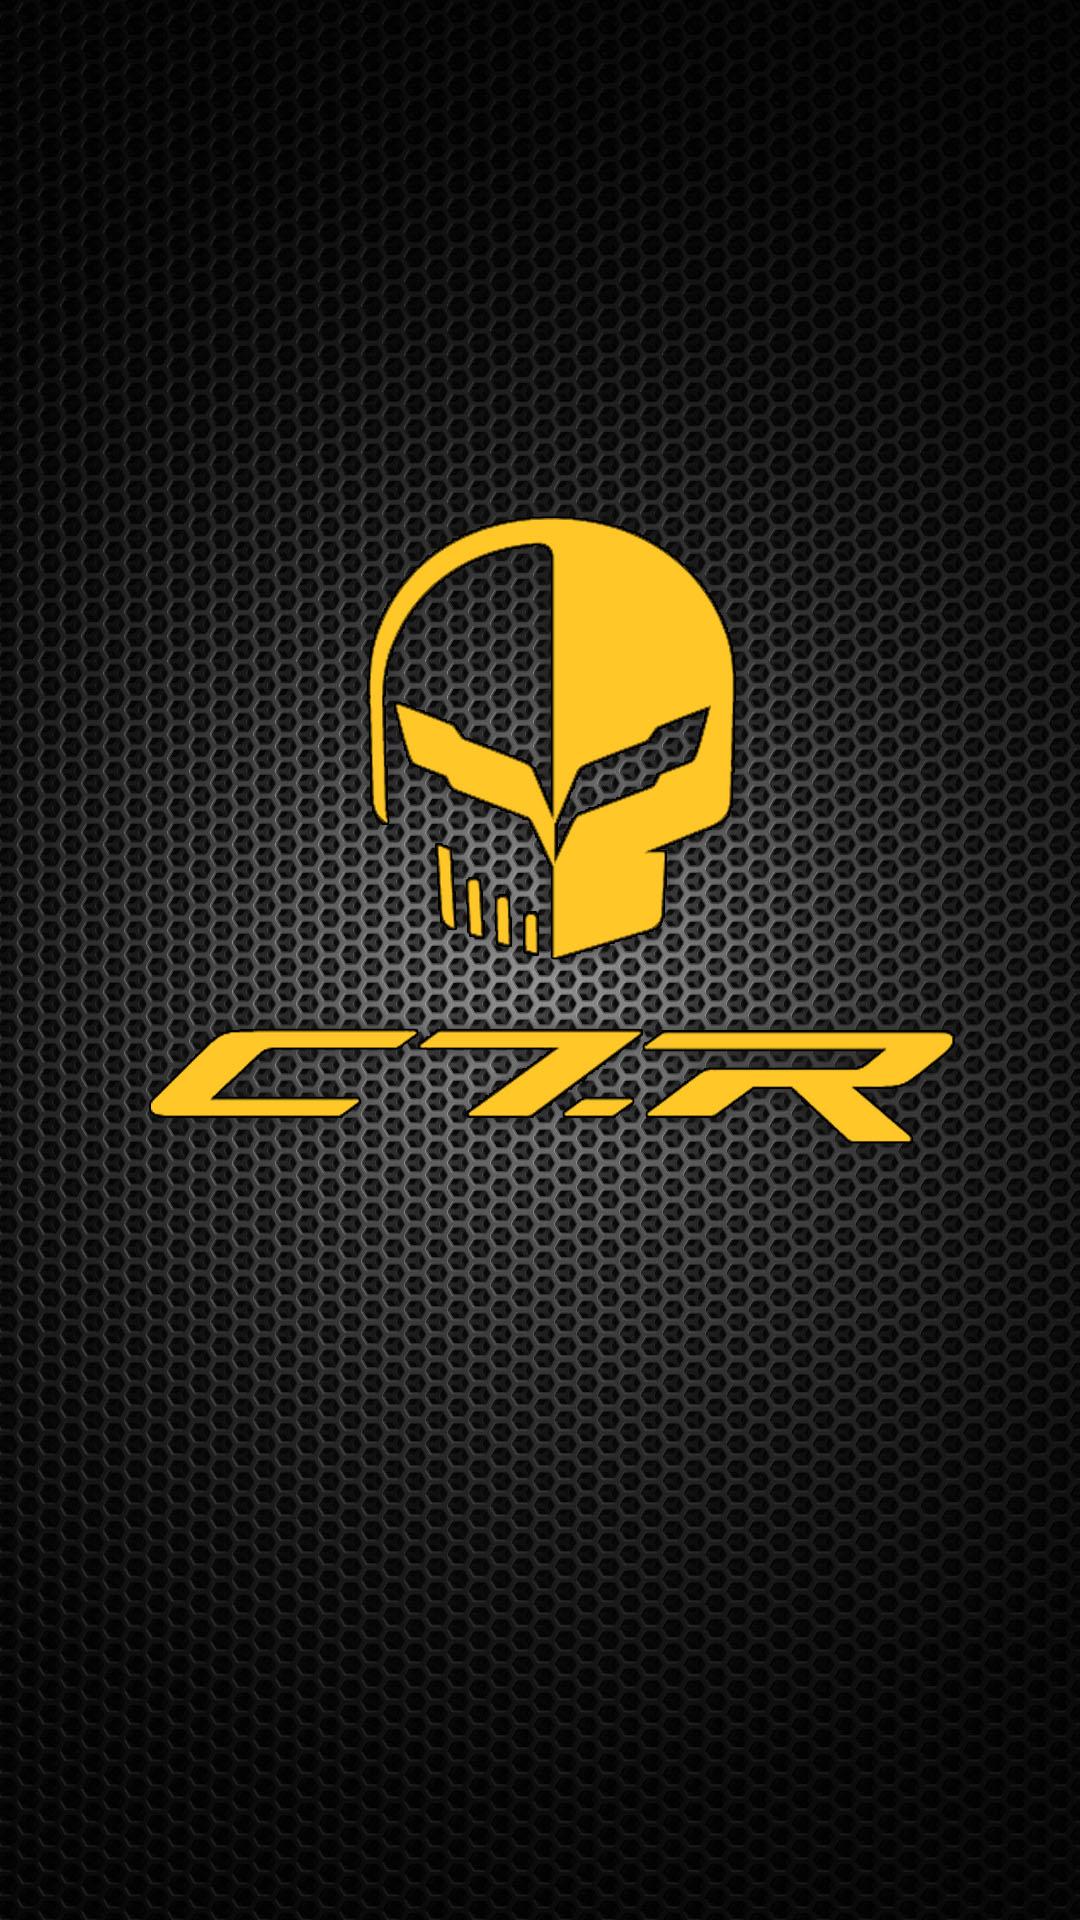 Chevrolet Corvette C7r Iphone Wallpaper